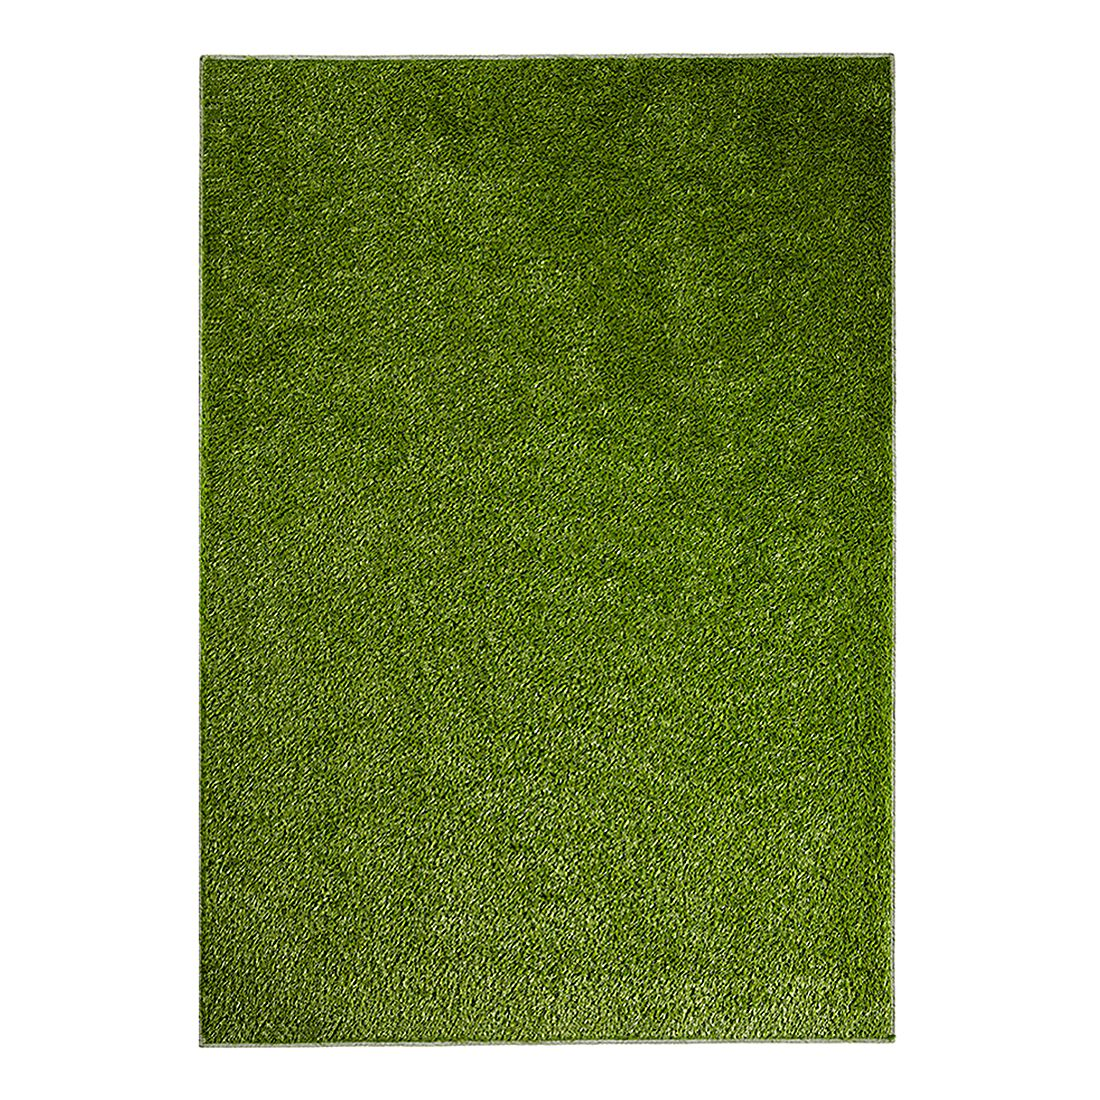 Outdoortapijt b.b Miami Style - groen - 67x130cm, barbara becker home passion